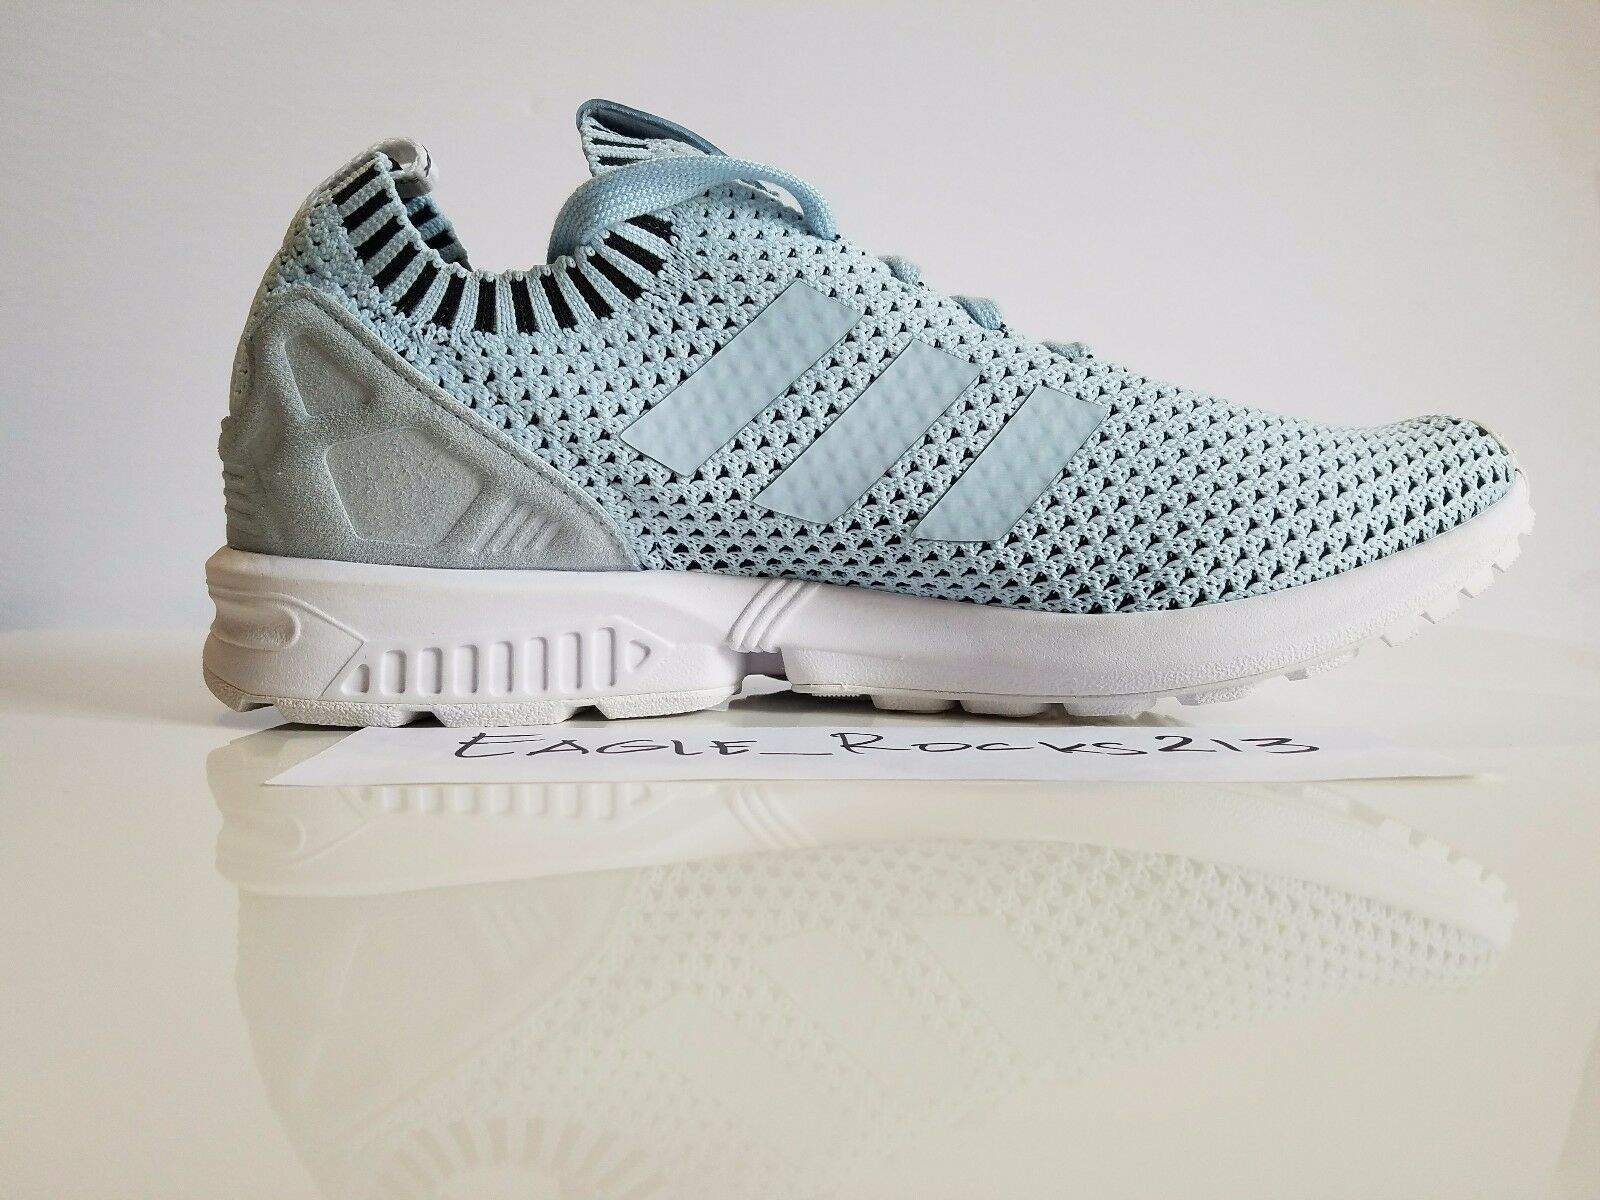 NEW Adidas ORIGINALS MEN'S ZX FLUX PK Primeknit Sneakers Ice Blue S75973 Size 9